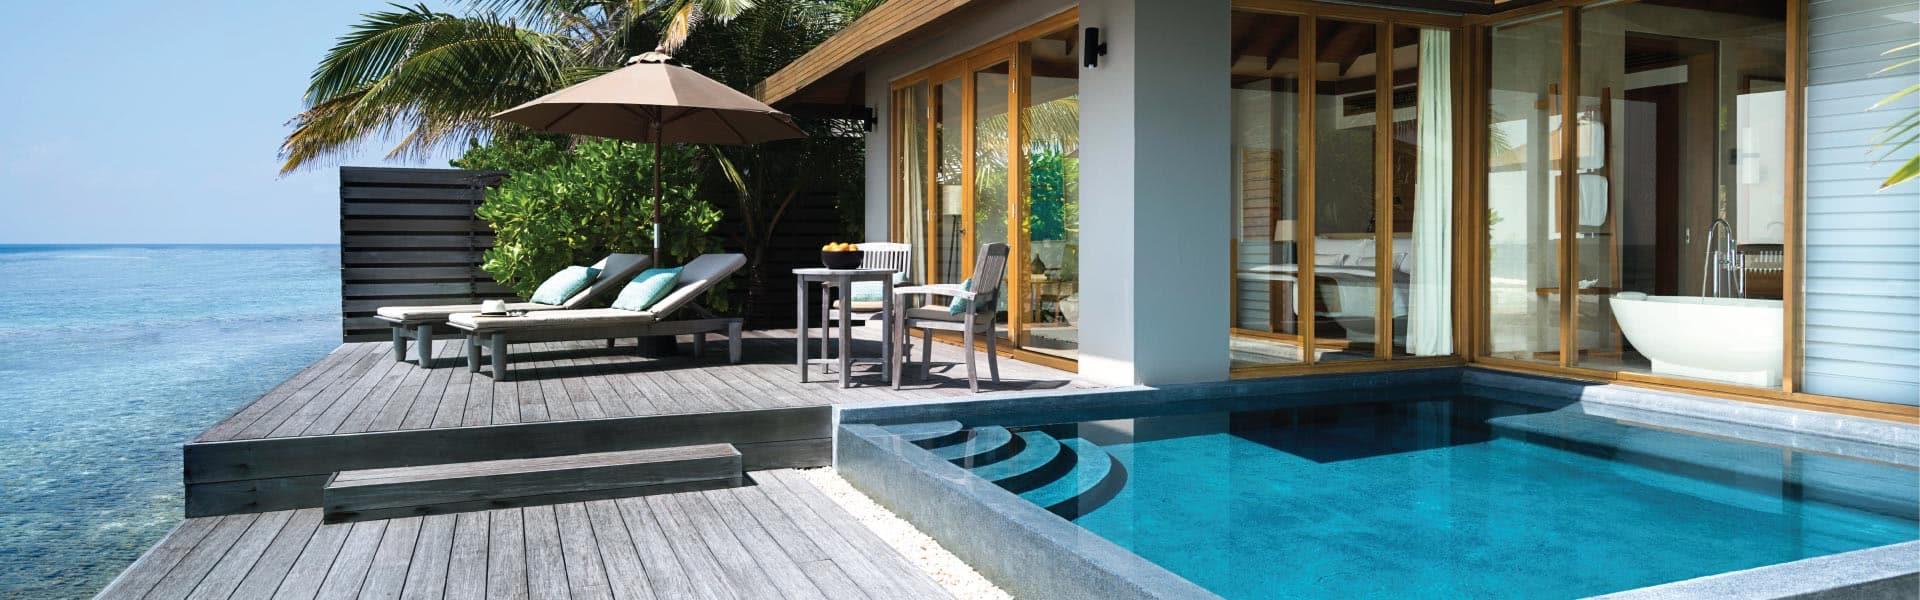 Honeymoon Villas In Maldives Anantara Veli Adults Only Resort Maldives